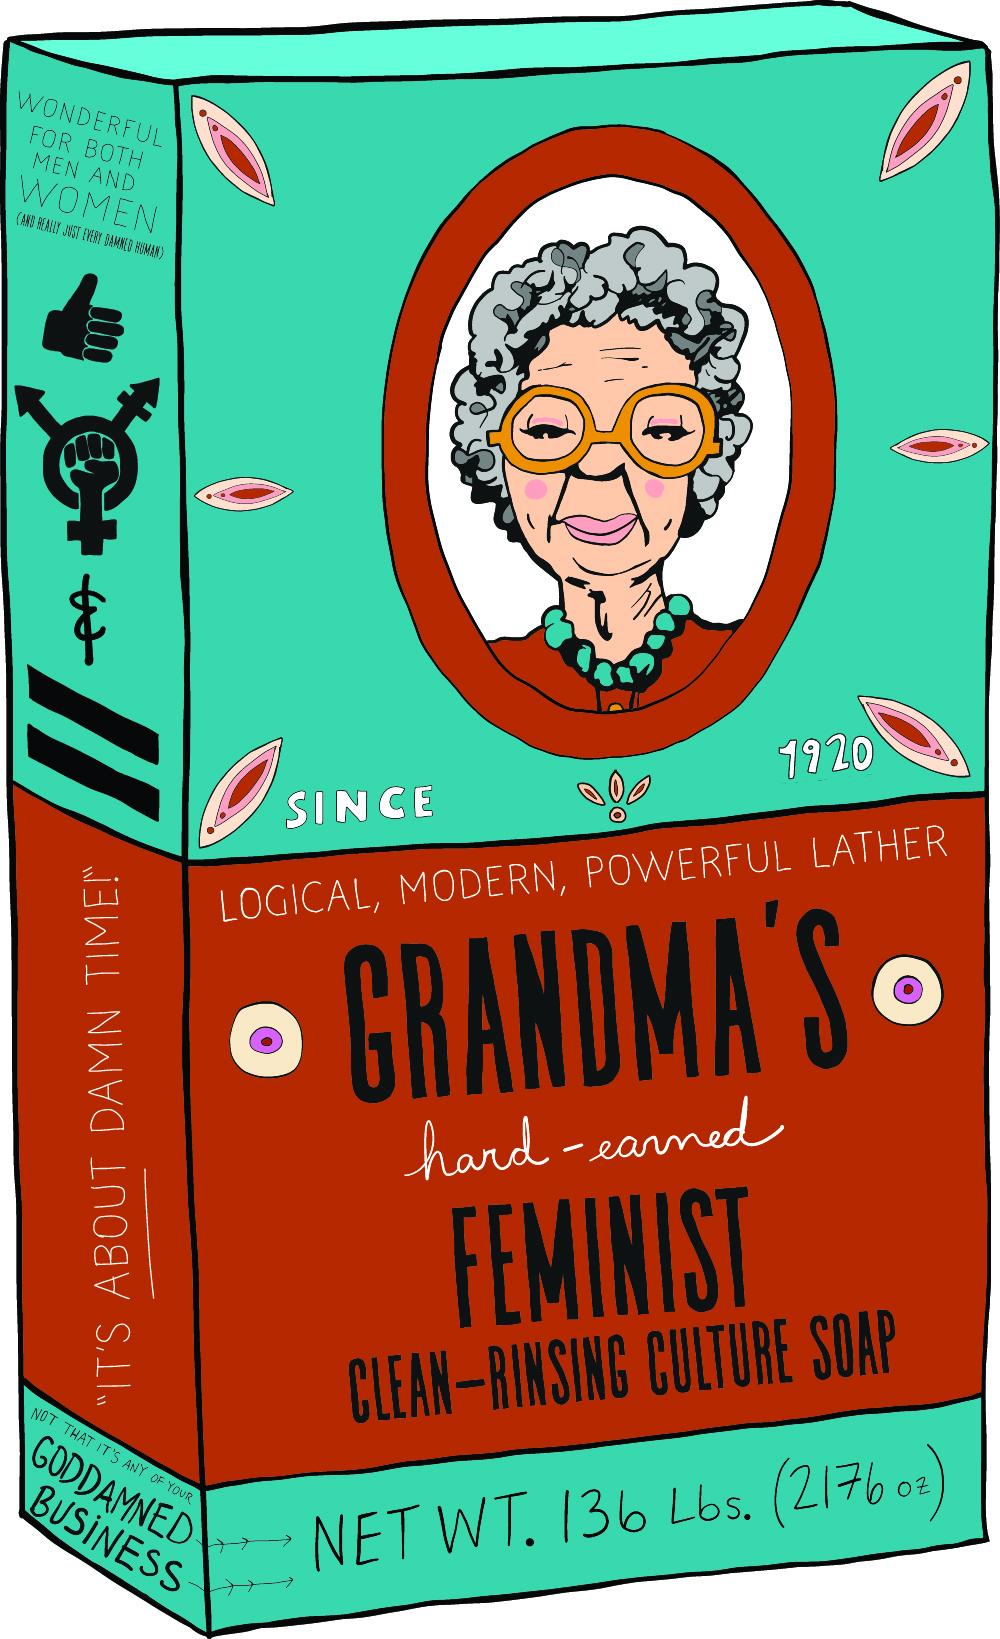 GRANDMA'S FEMINIST SOAP